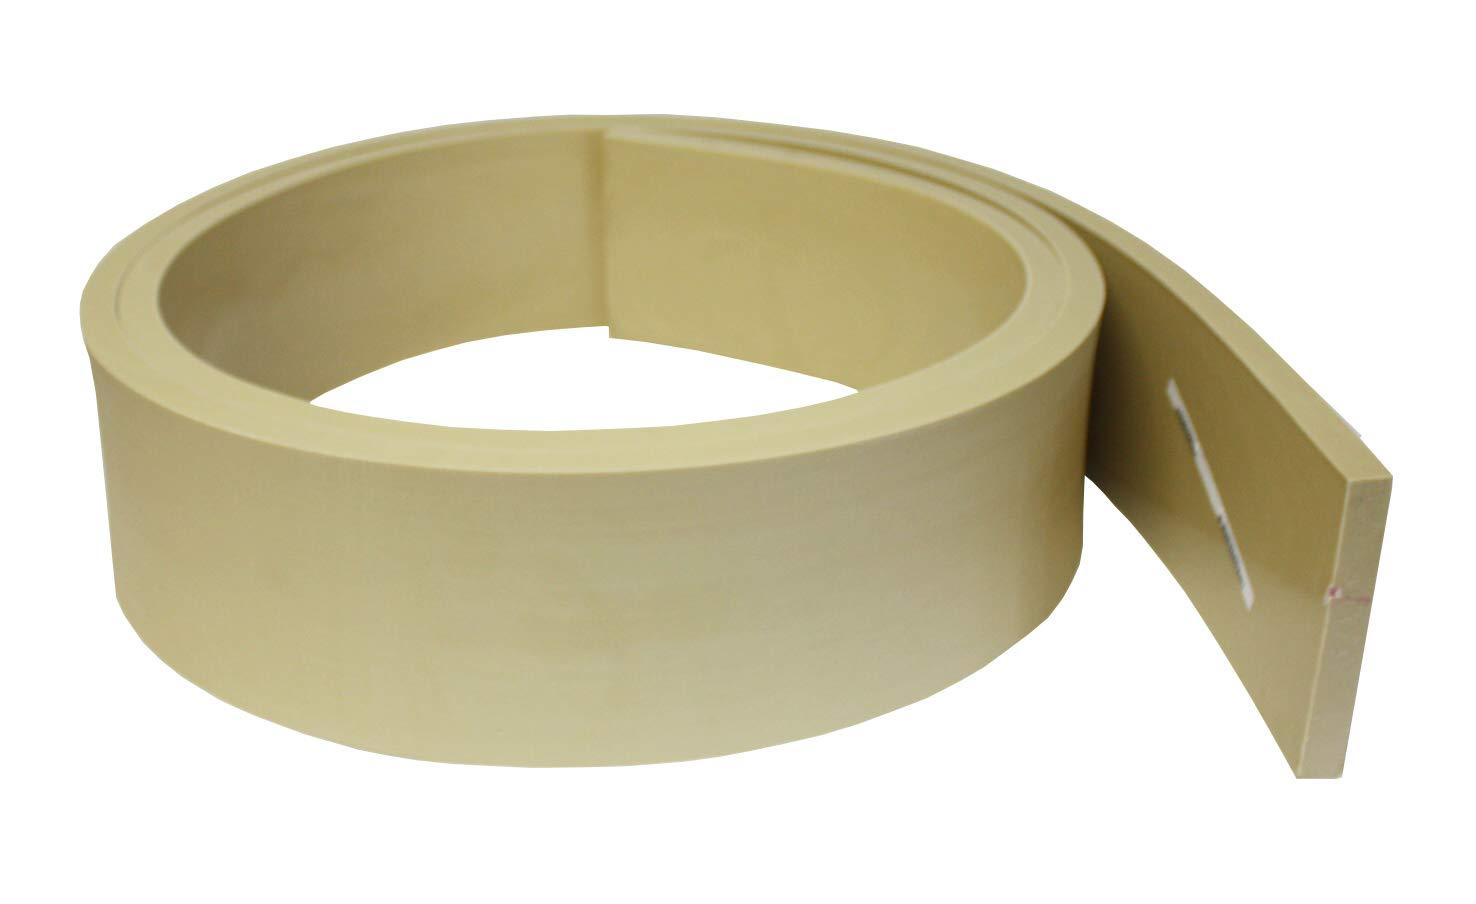 Flexible Moulding - Flexible Flatstock Moulding - WM1X4-3/4'' X 3-1/2'' - 12' Length - Flexible Trim by Duraflex by Resinart